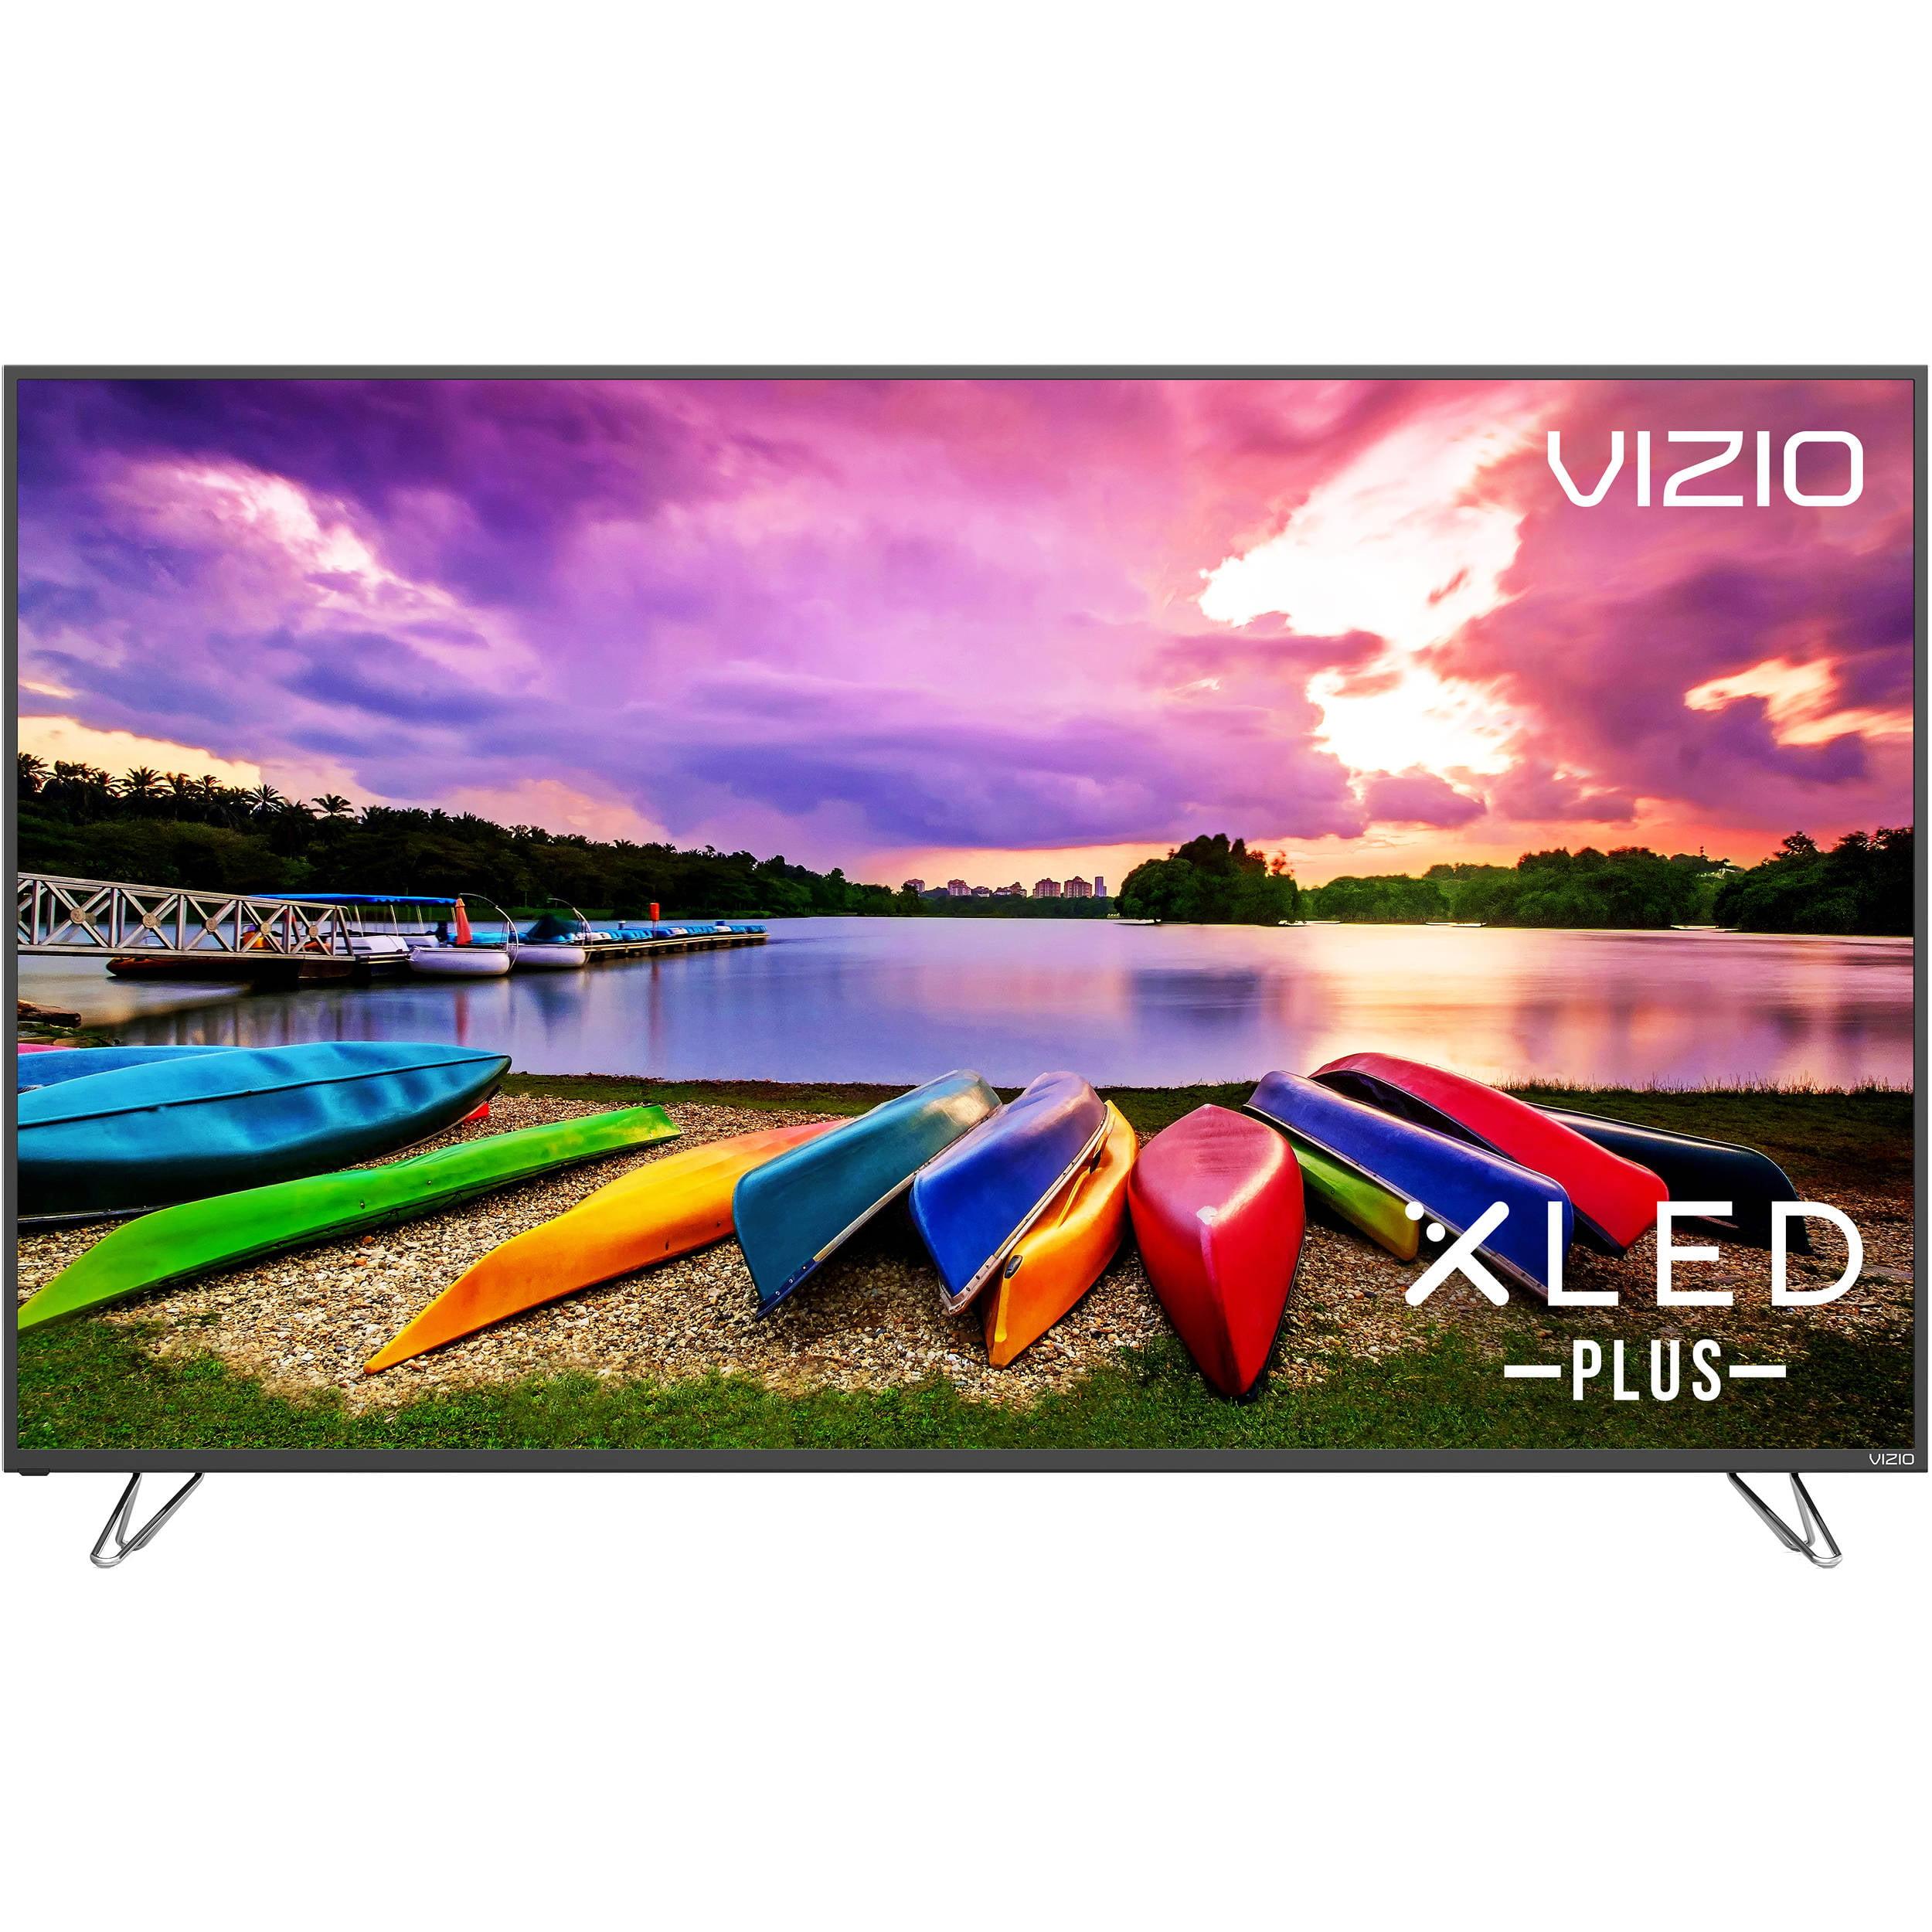 Refurbished VIZIO M70-E3 Class 4K (2160p) HDR Smart XLED Home Theater Display 70